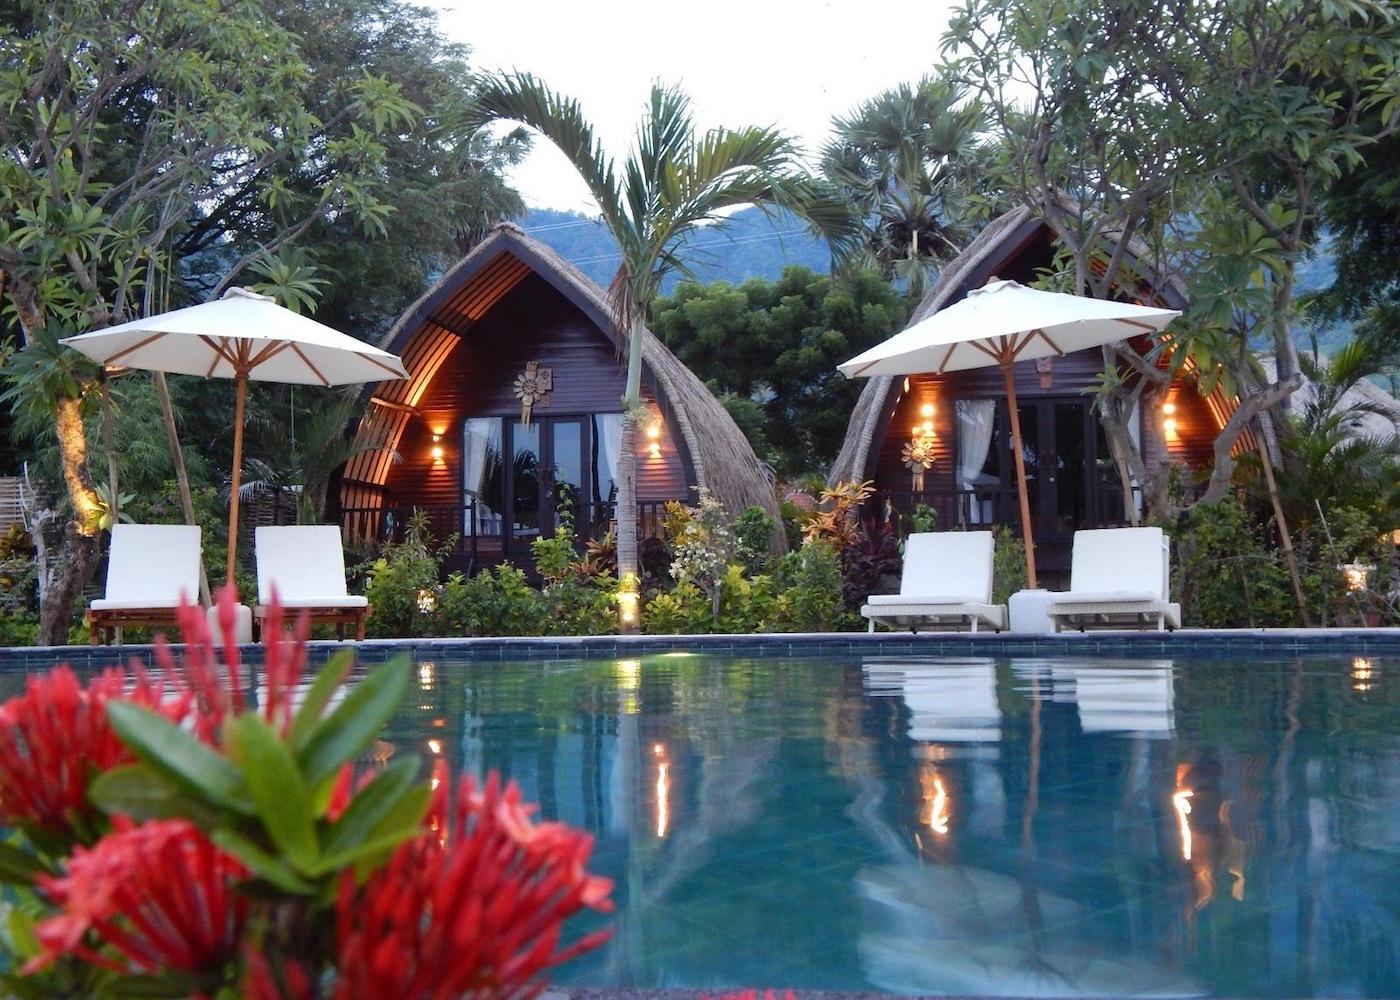 Kinaara Resort & Spa in Pemuteran, North Bali, Indonesia